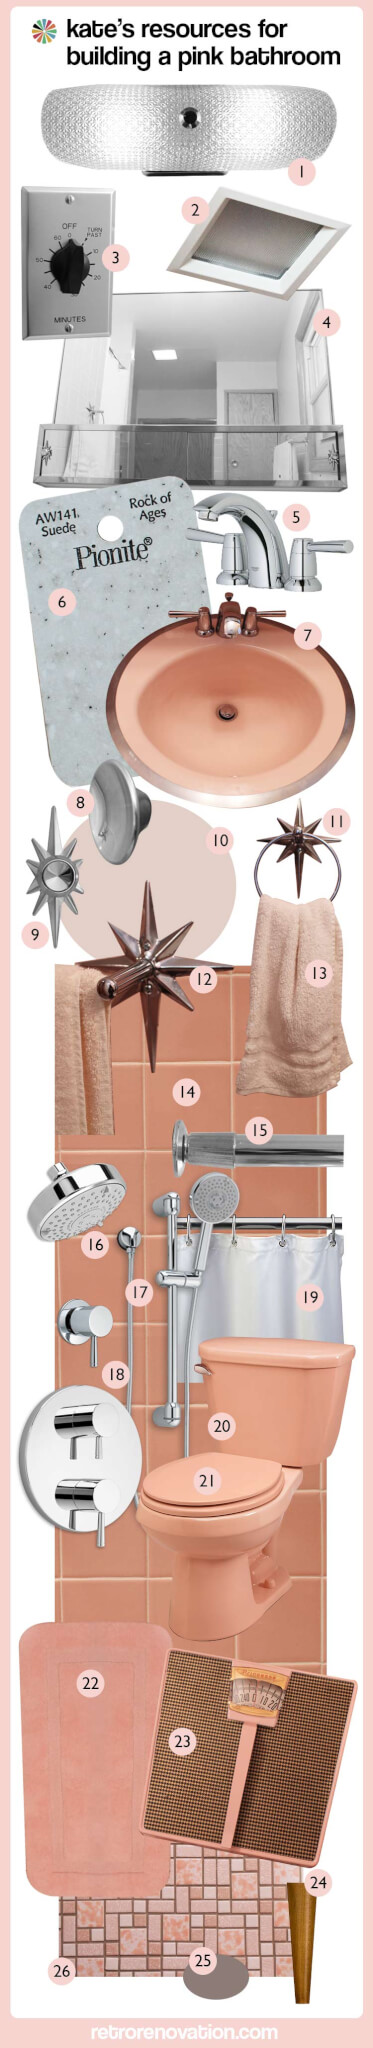 pink bathroom sources